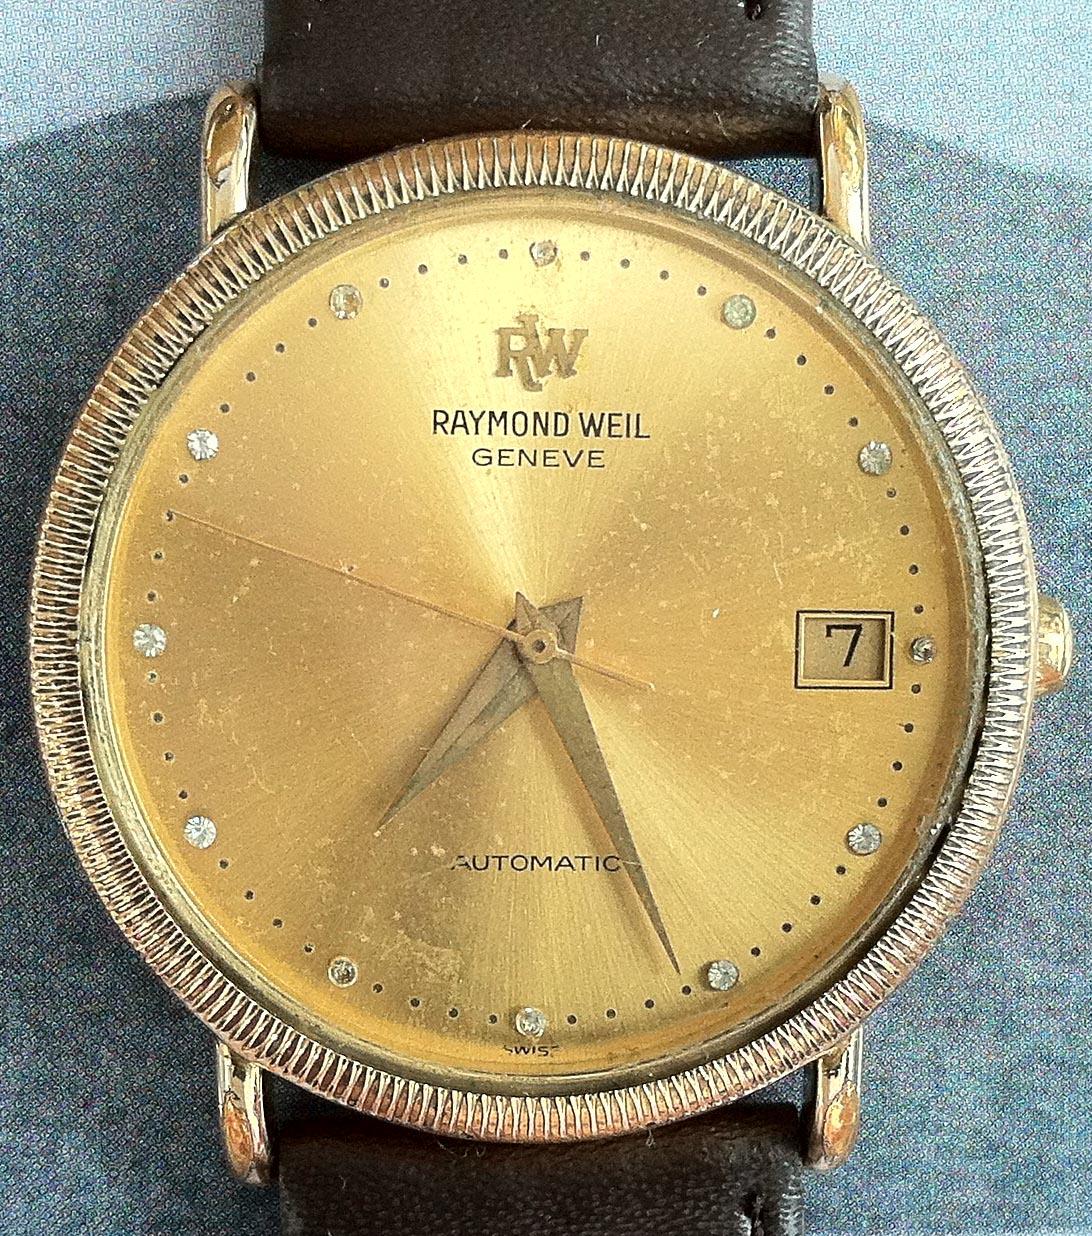 европейской raymond weil watches geneve например